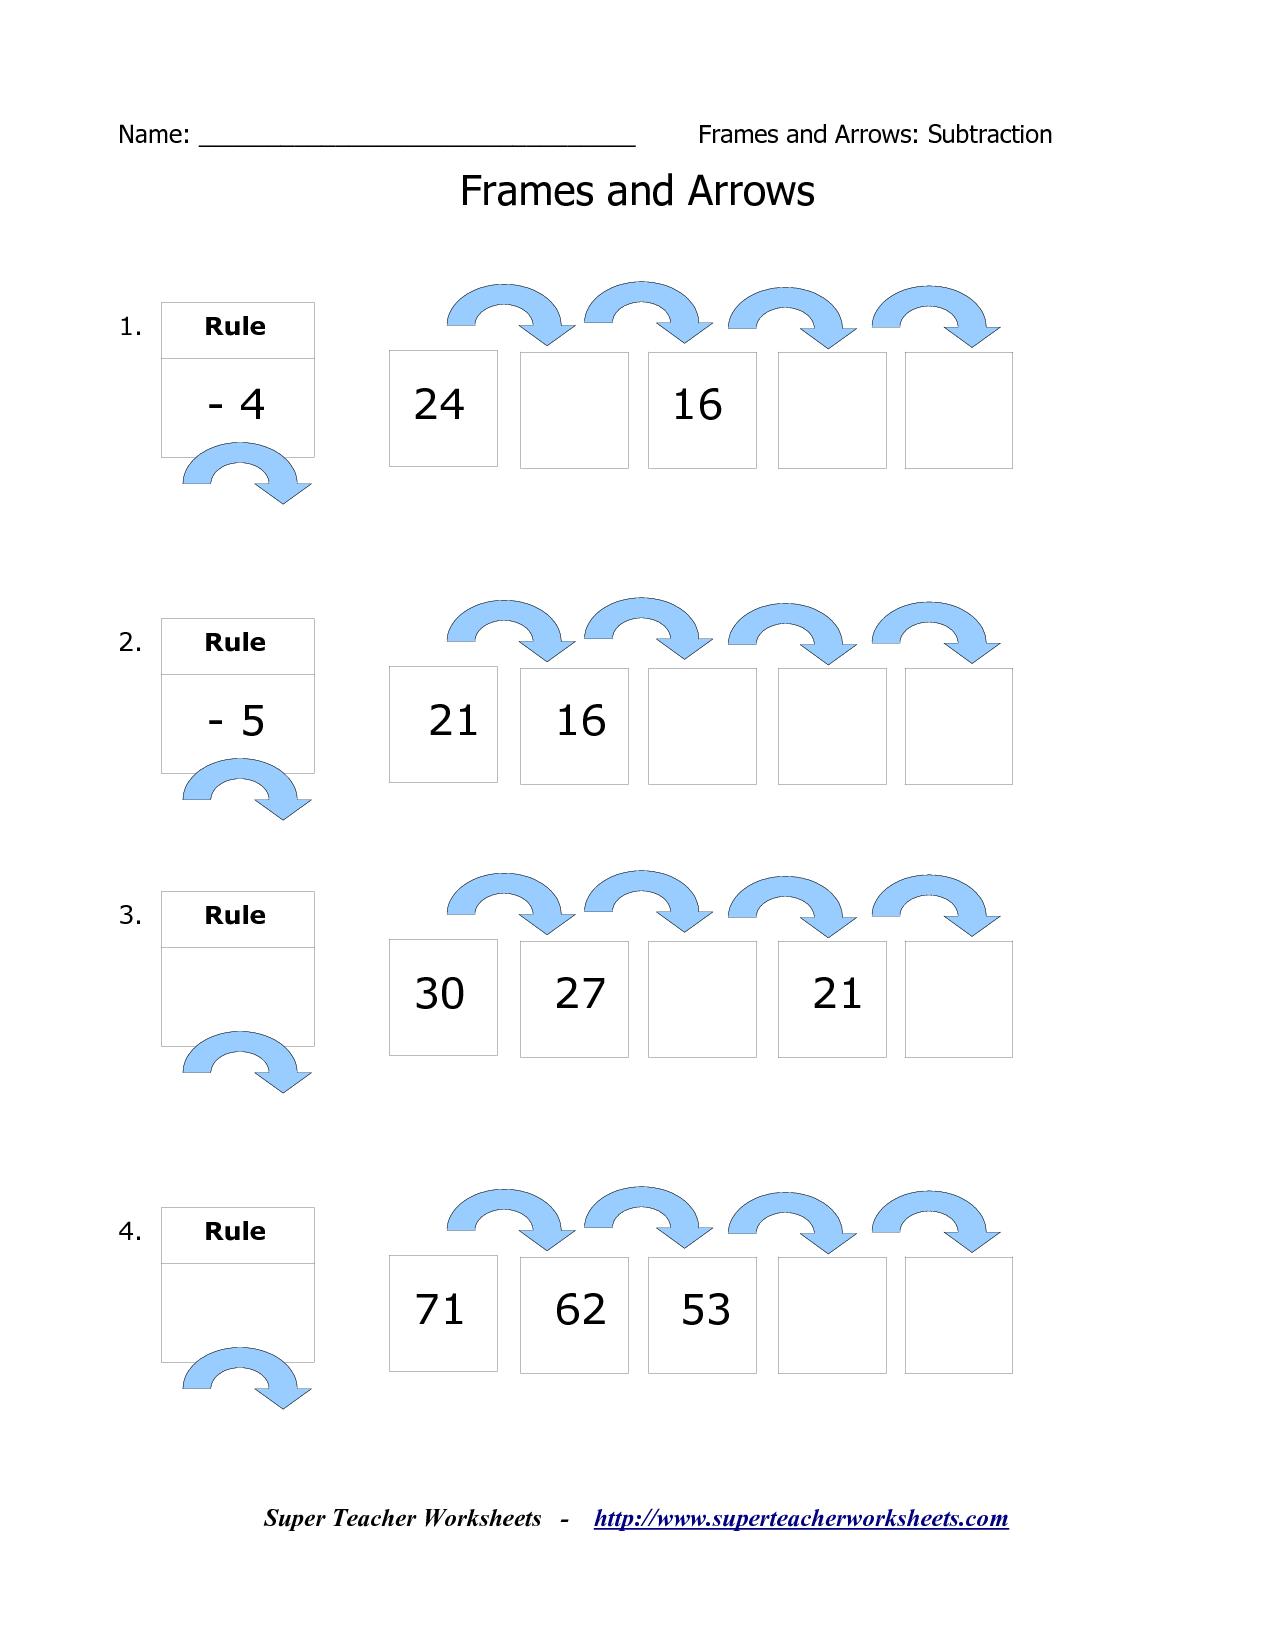 Frames And Arrows Worksheets First Grade Super Teacher Worksheets Third Grade Math Worksheets [ 1650 x 1275 Pixel ]